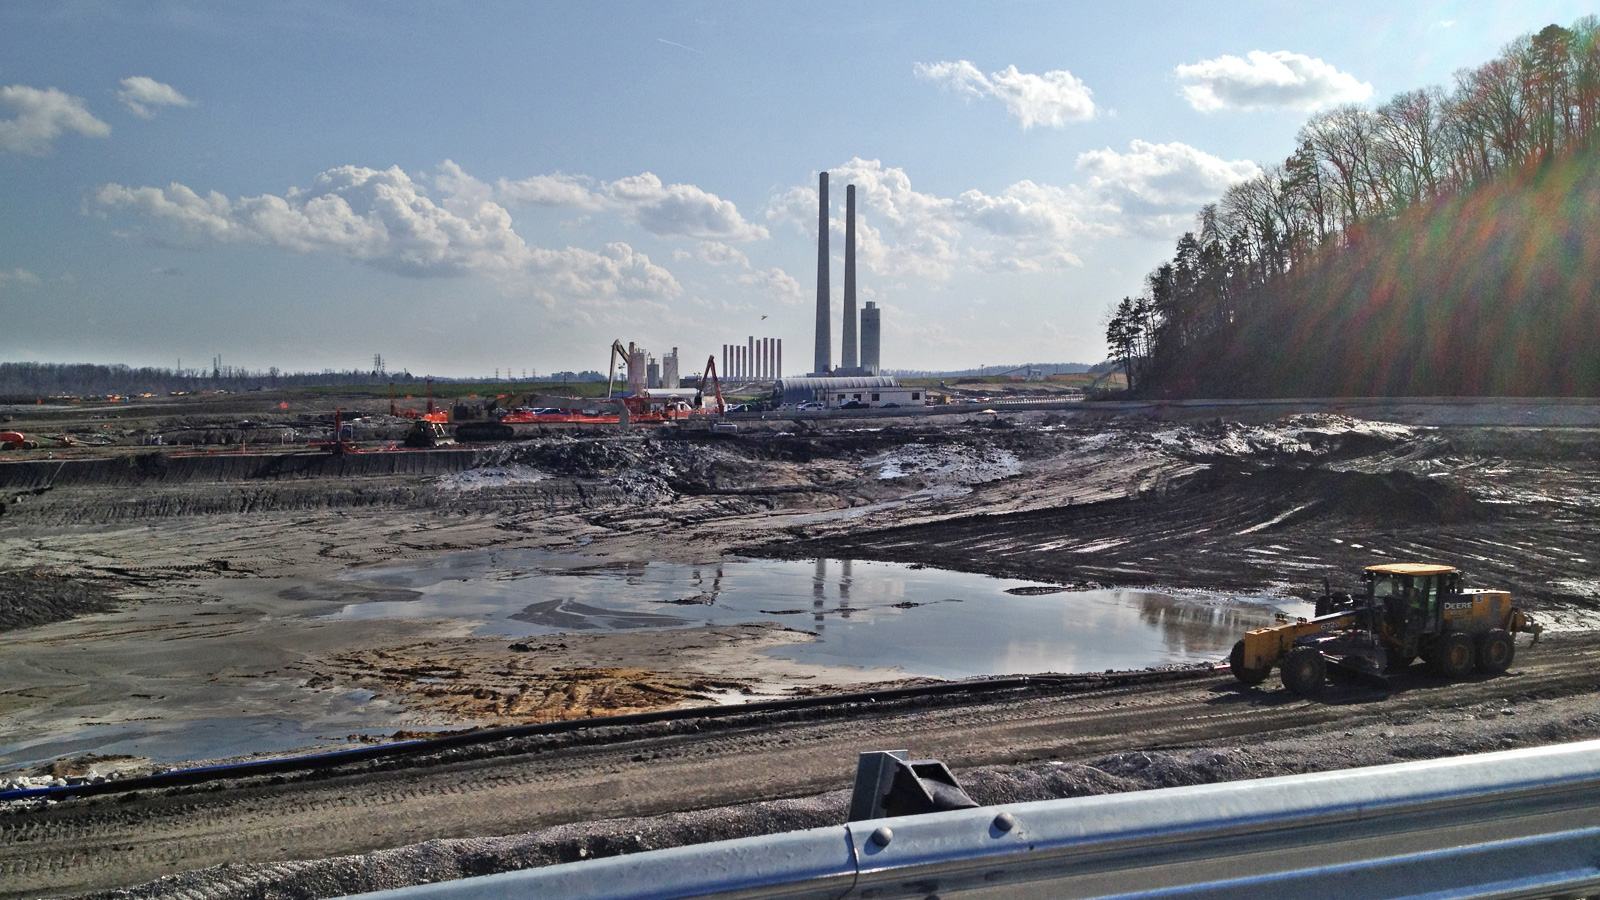 coal slurry mess